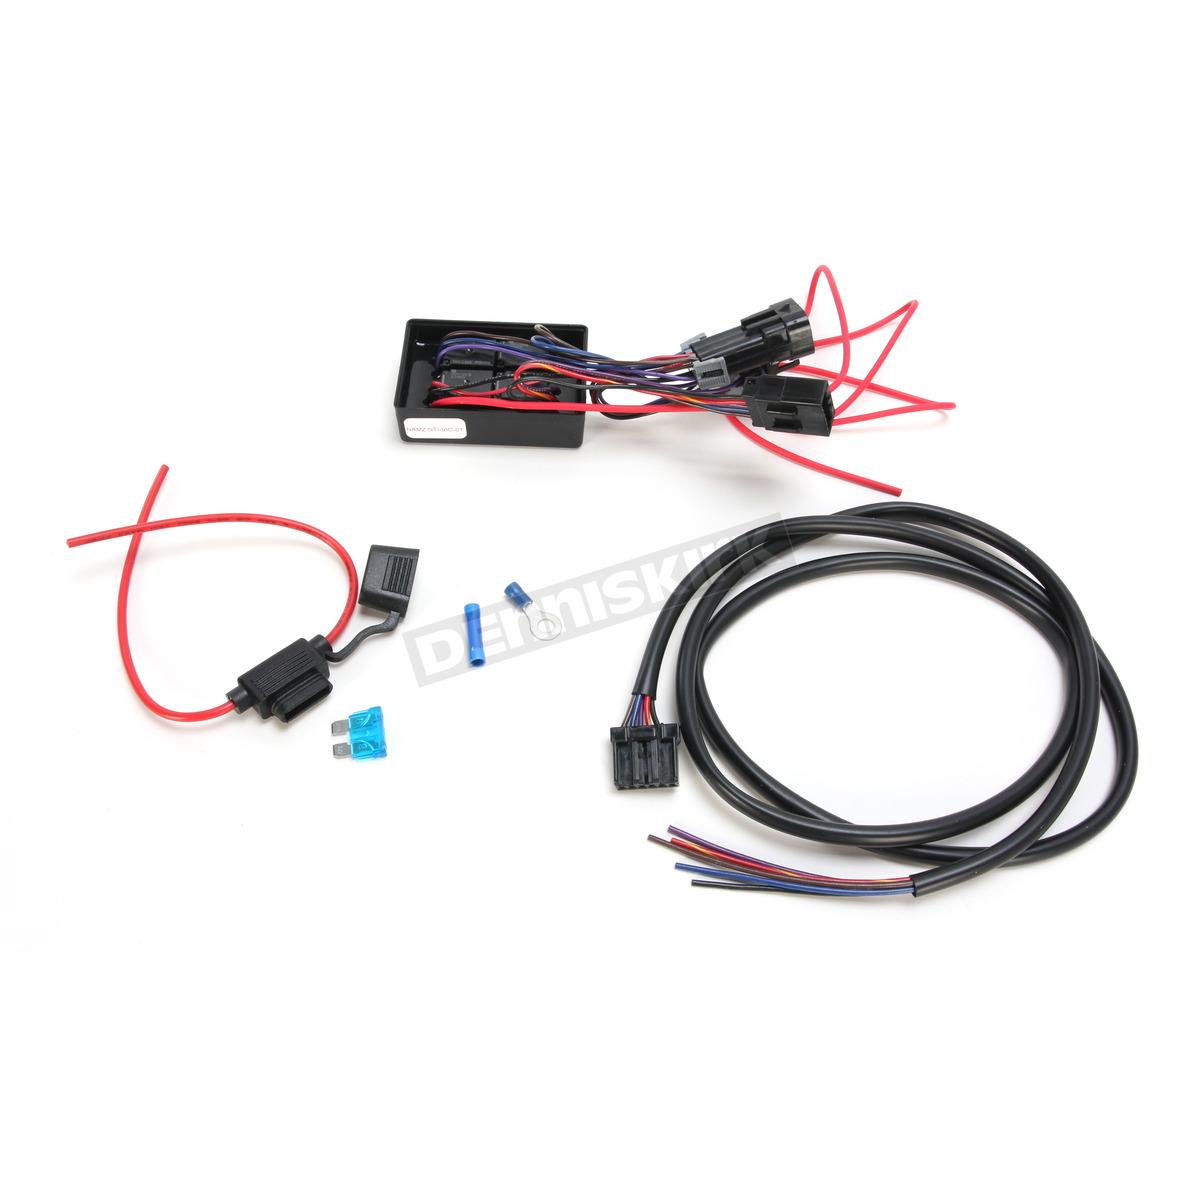 Namz Custom Cycle Products Trailer Isolator Module W 4 Pin